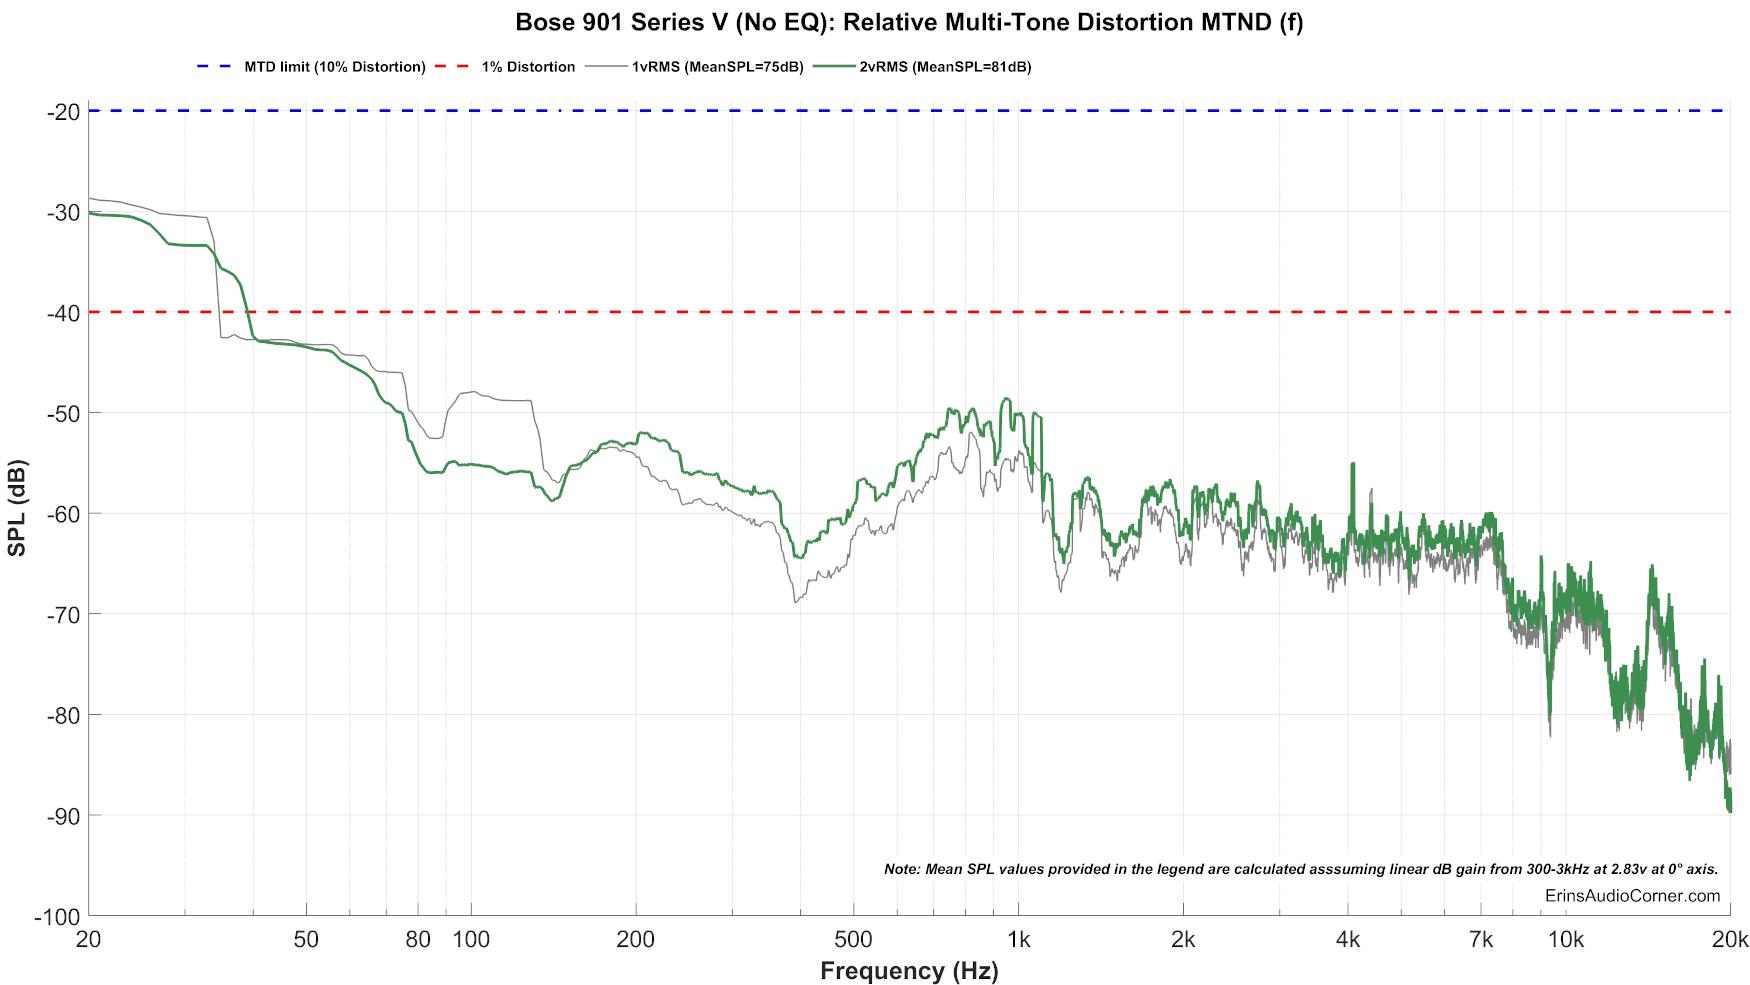 Bose%20901%20Series%20V%20(No%20EQ)_MTON_Distortion%2080.png